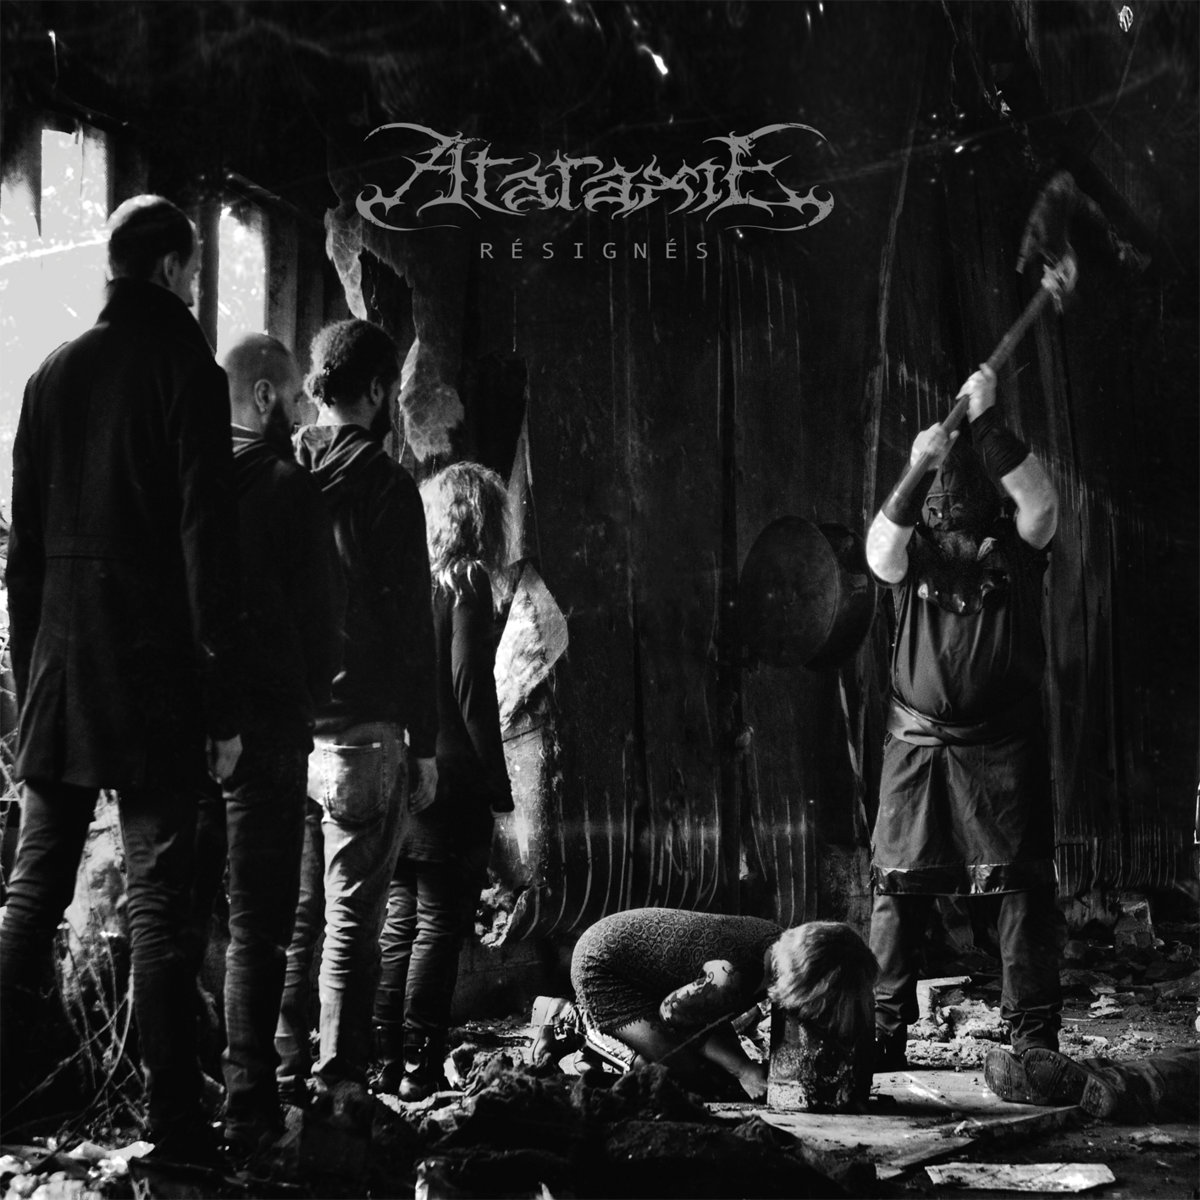 ataraxie résignés extreme doom metal français